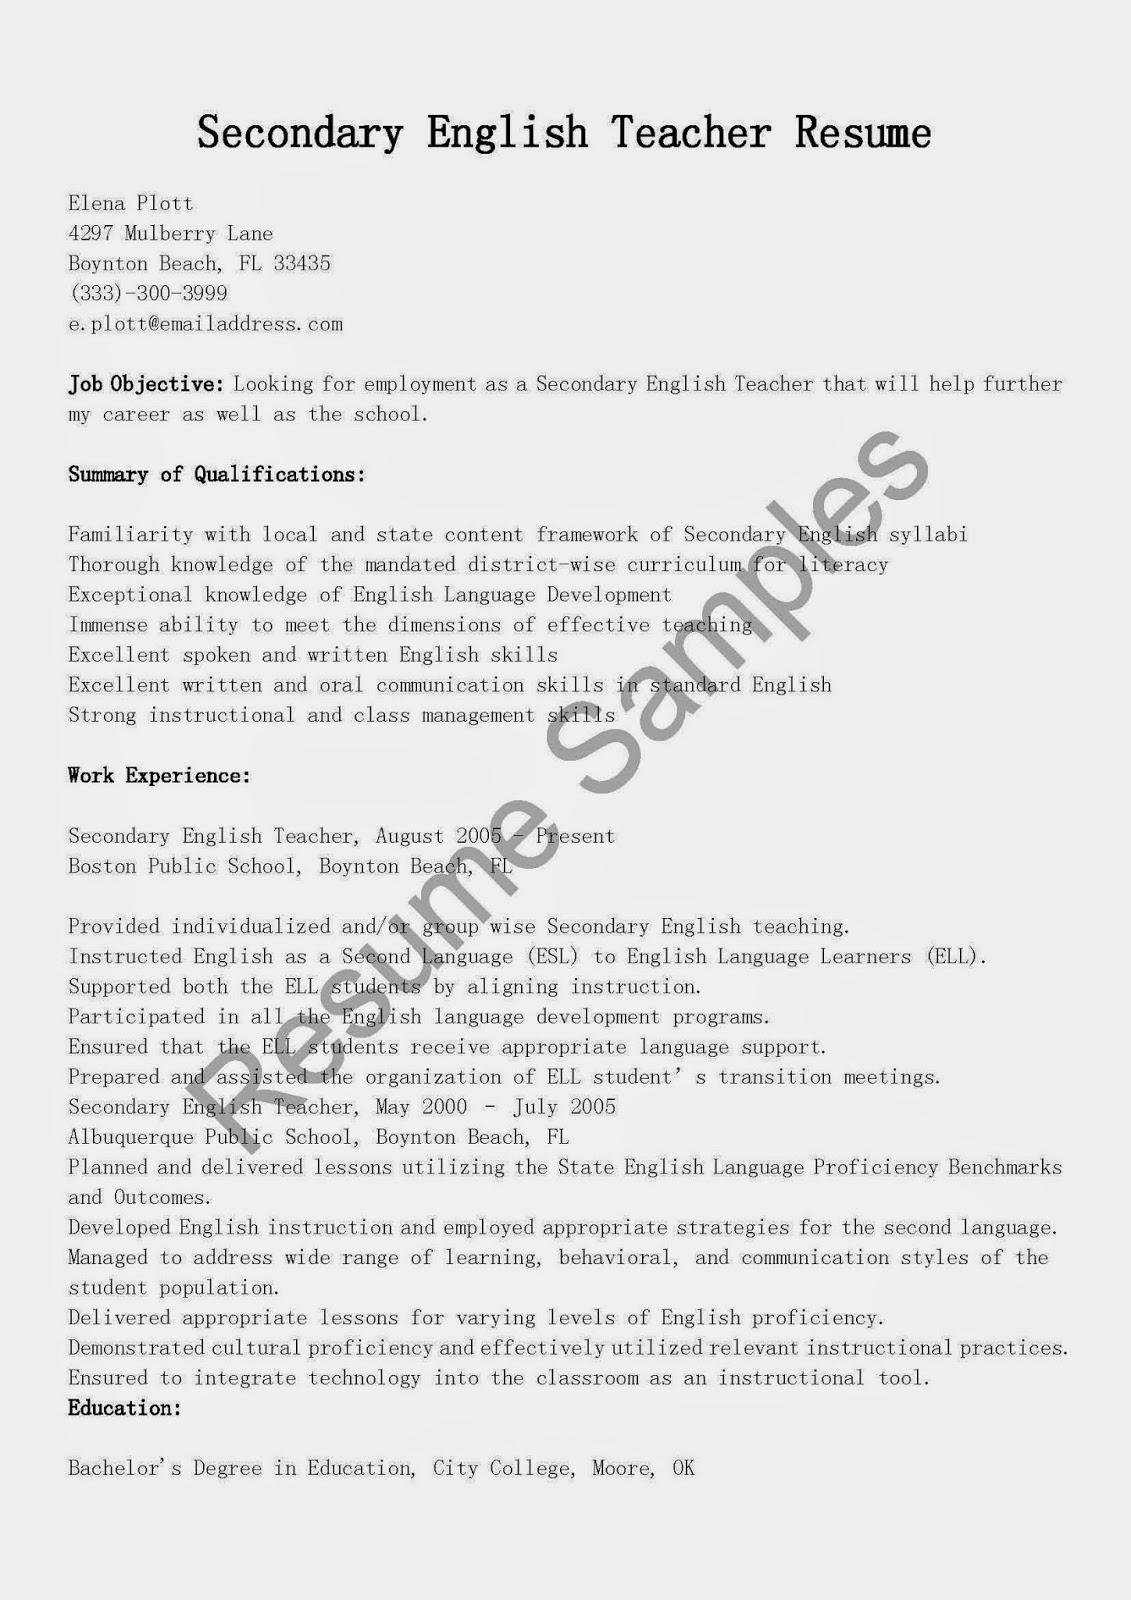 sample esl teacher resumes - Esl Teachers Resume